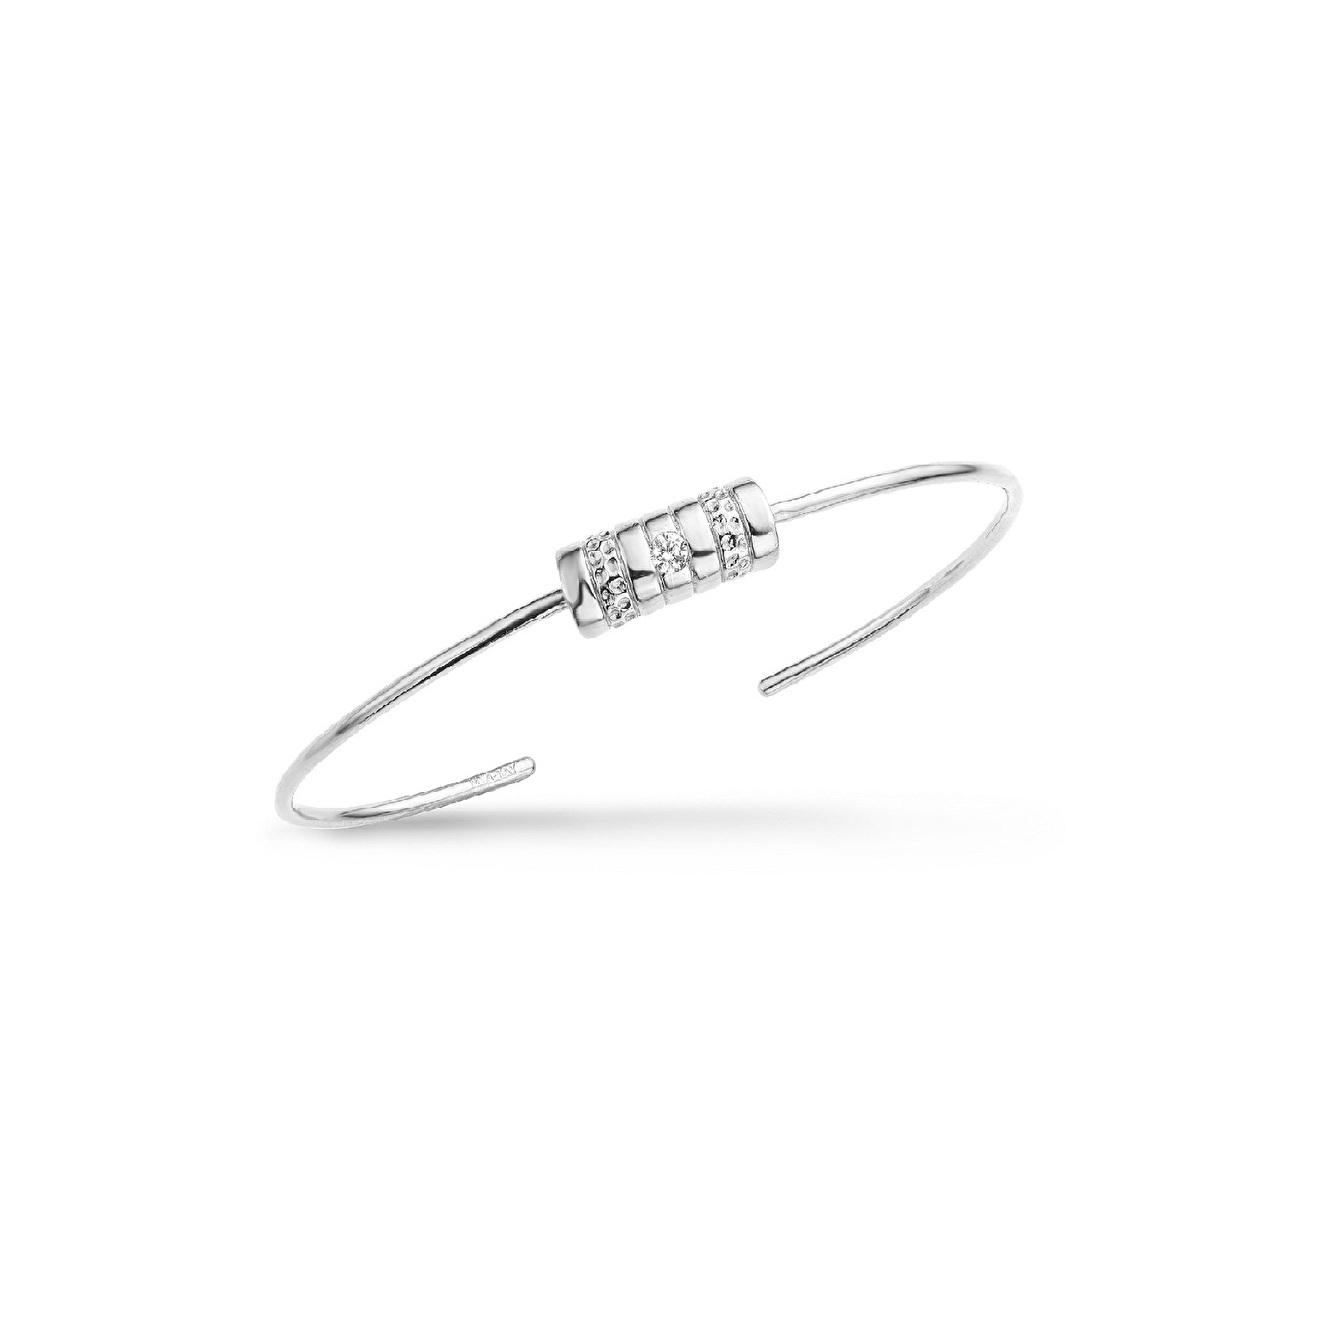 Mya Bay Покрытый серебром браслет Charlize